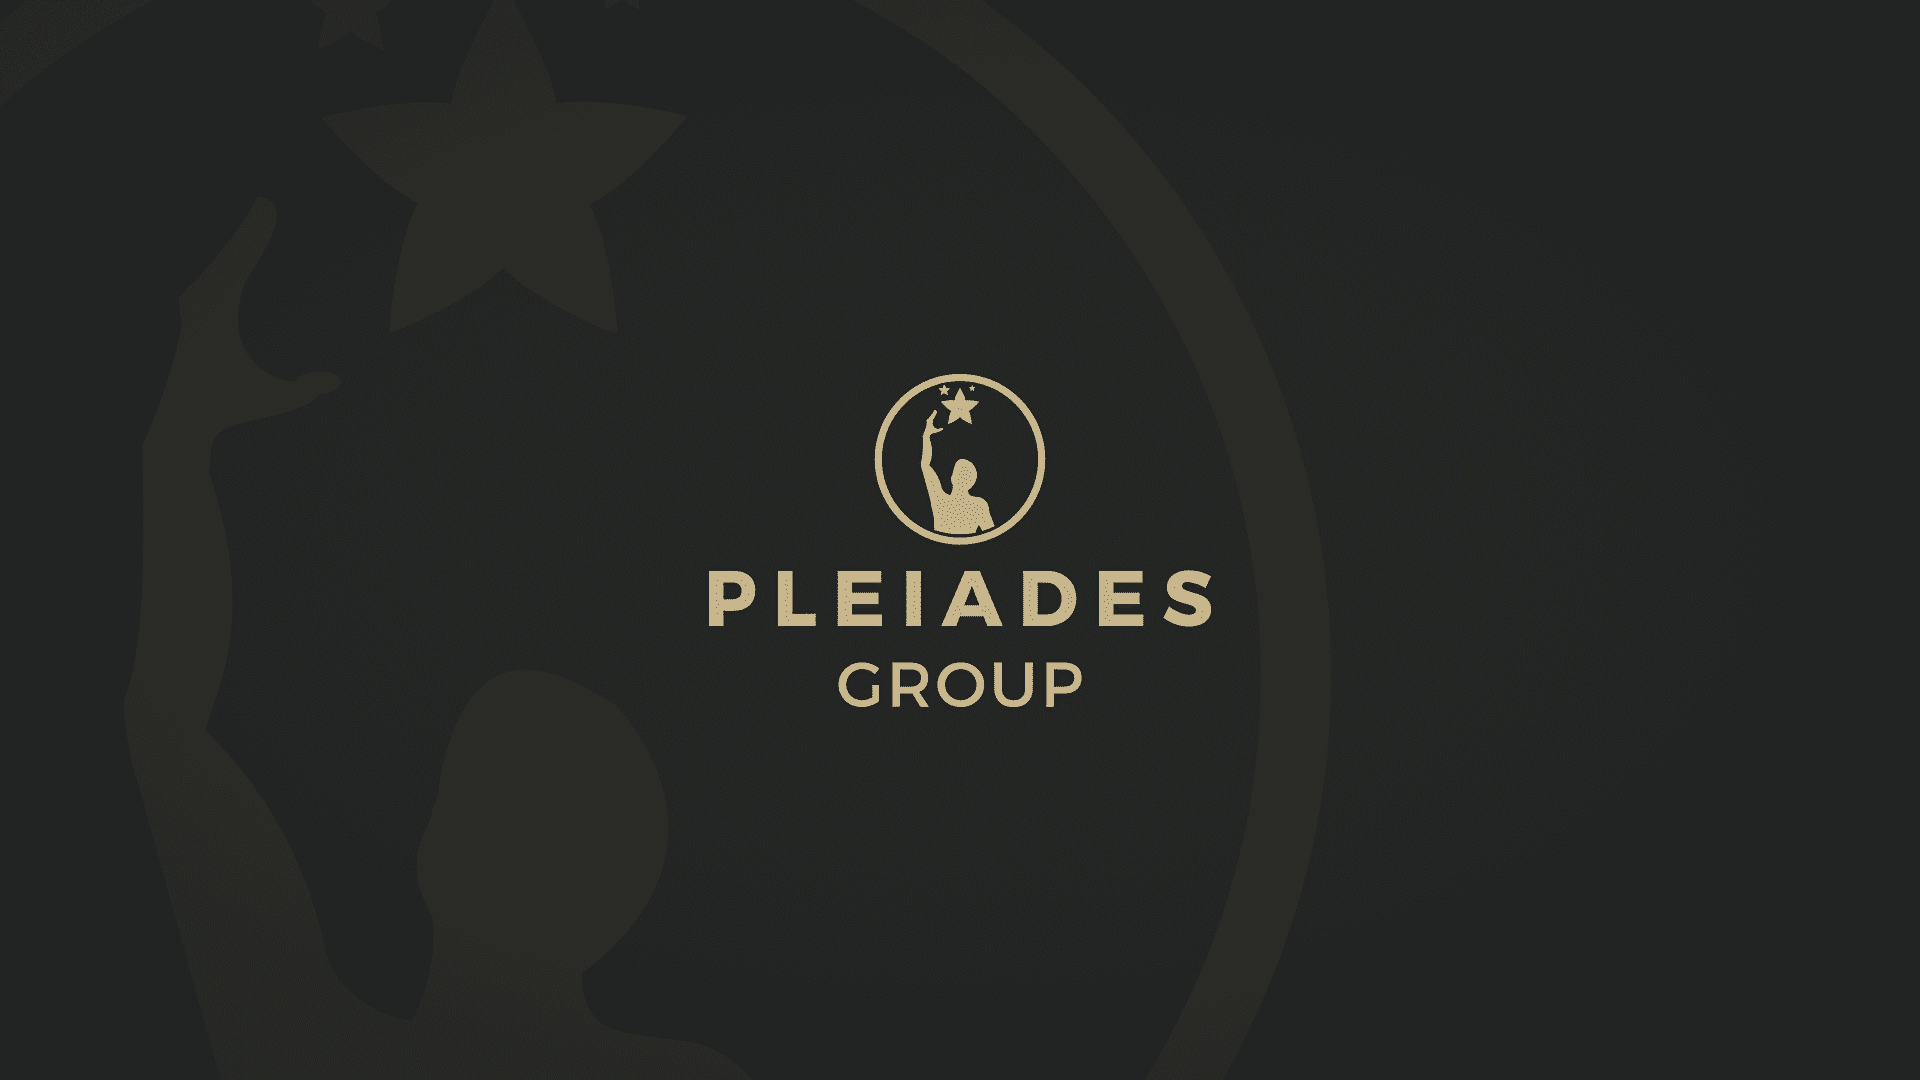 Pleiades-Group E.E image